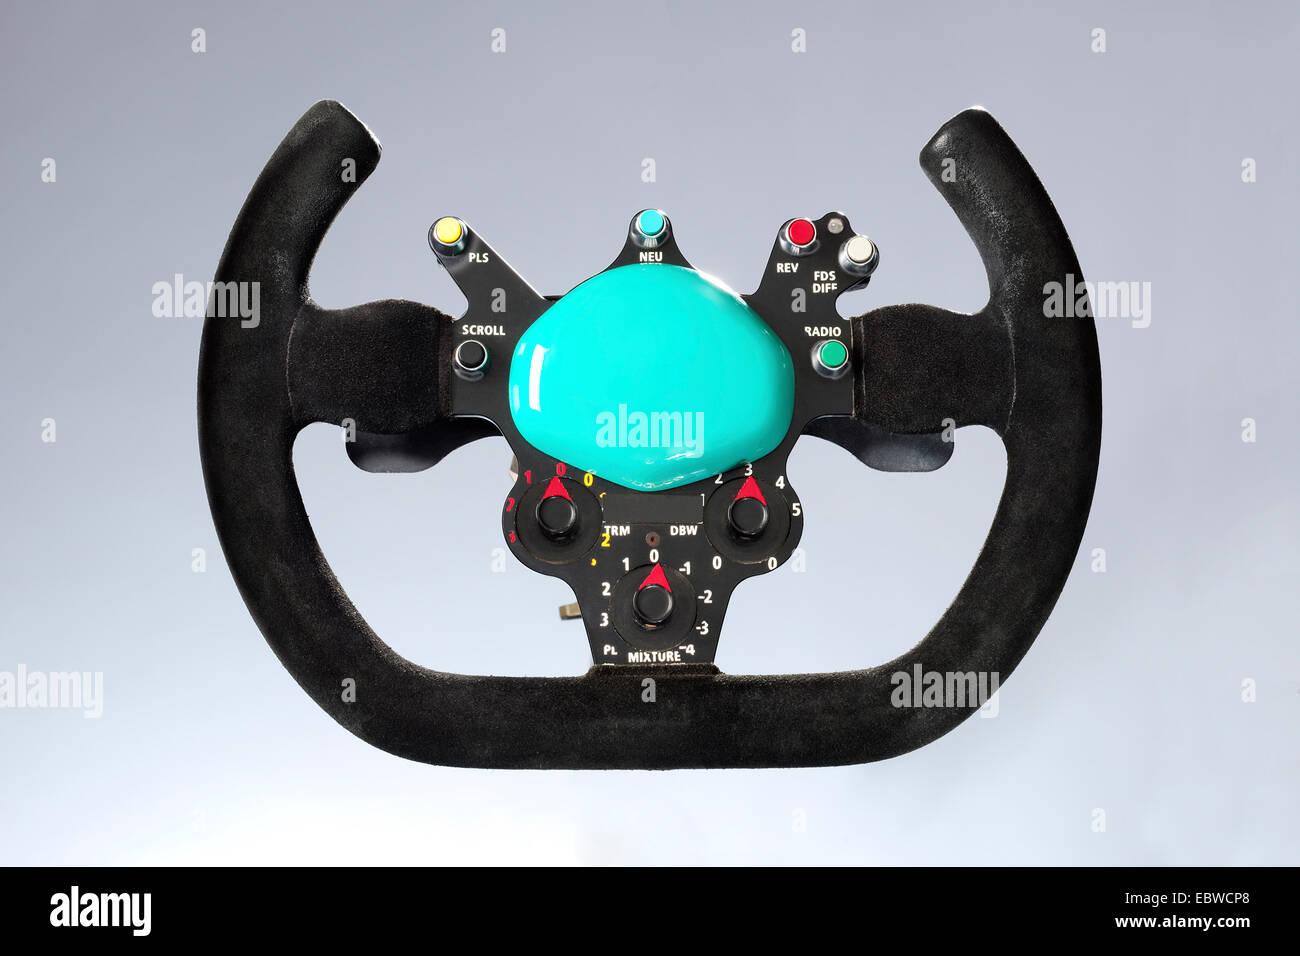 A Racing car steering wheel - Stock Image